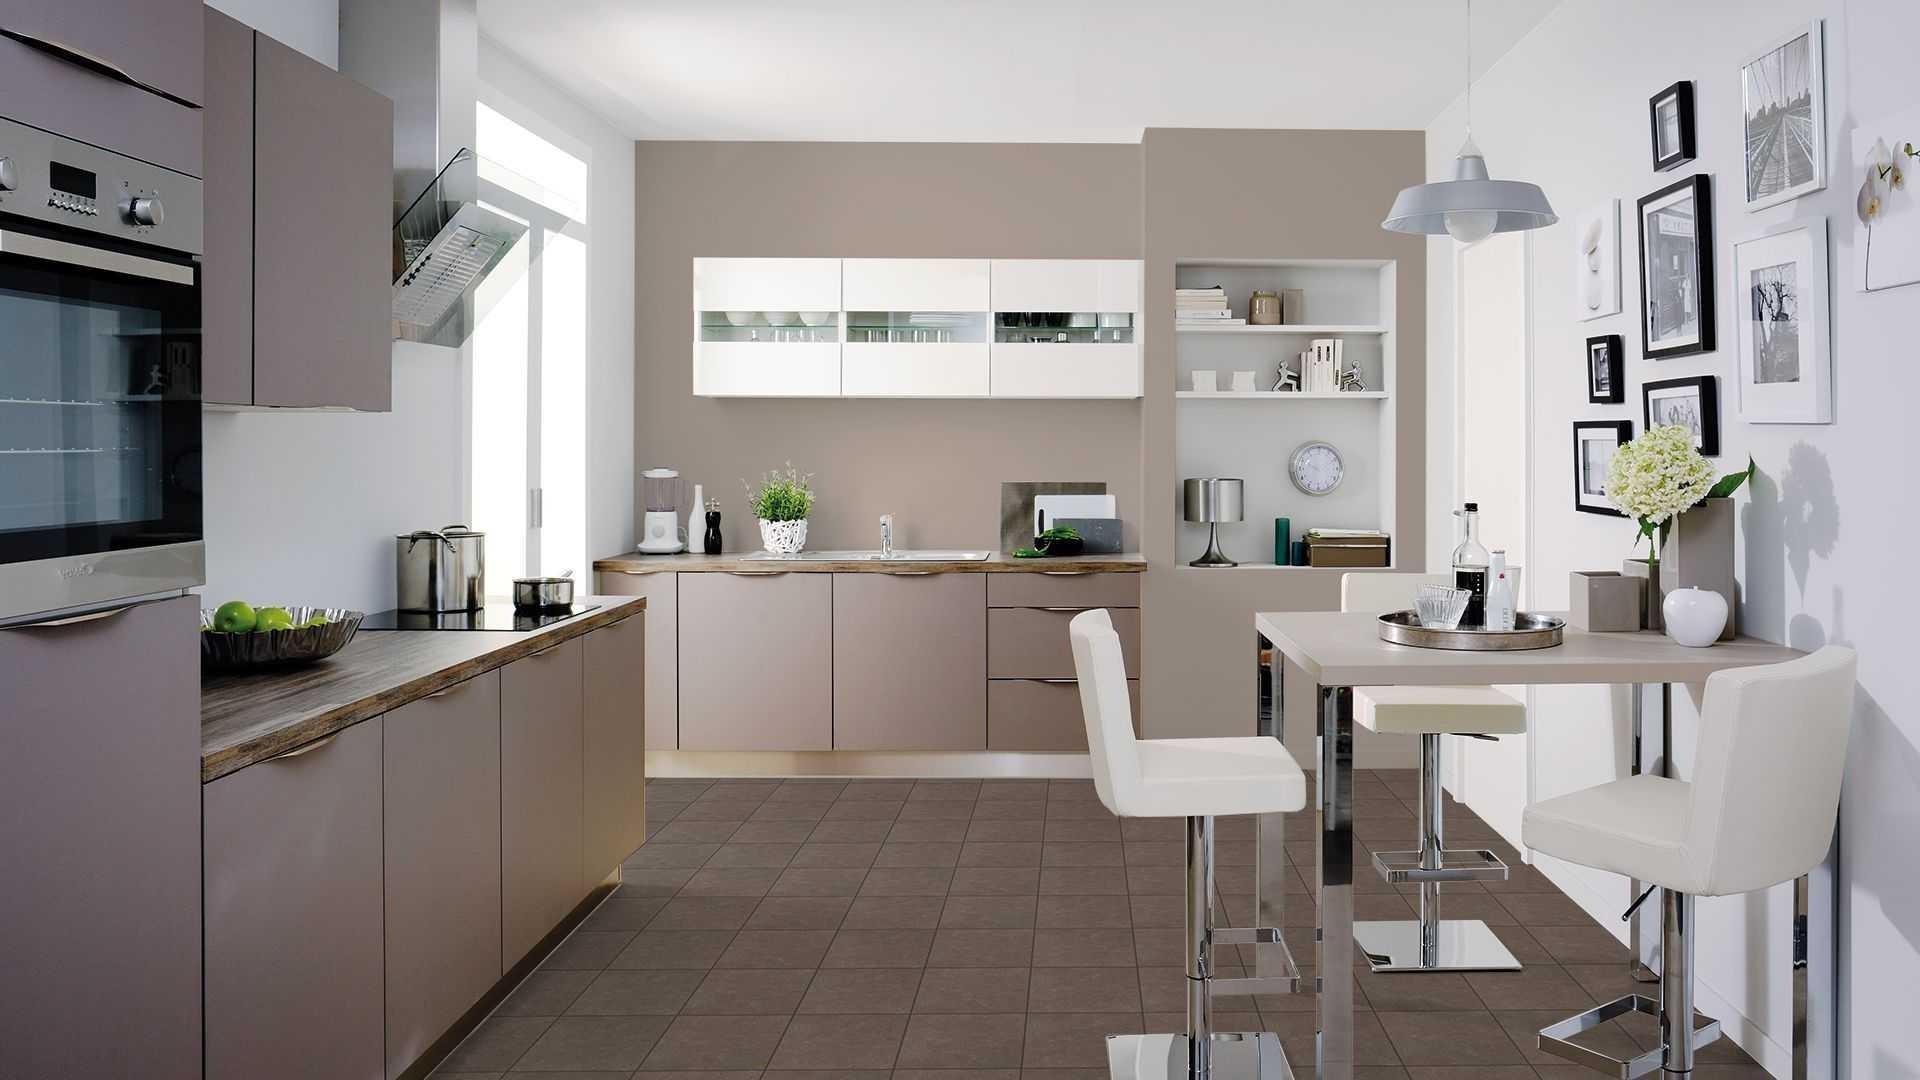 Poign e meuble cuisine castorama cuisine id es de for Meuble cuisine castorama